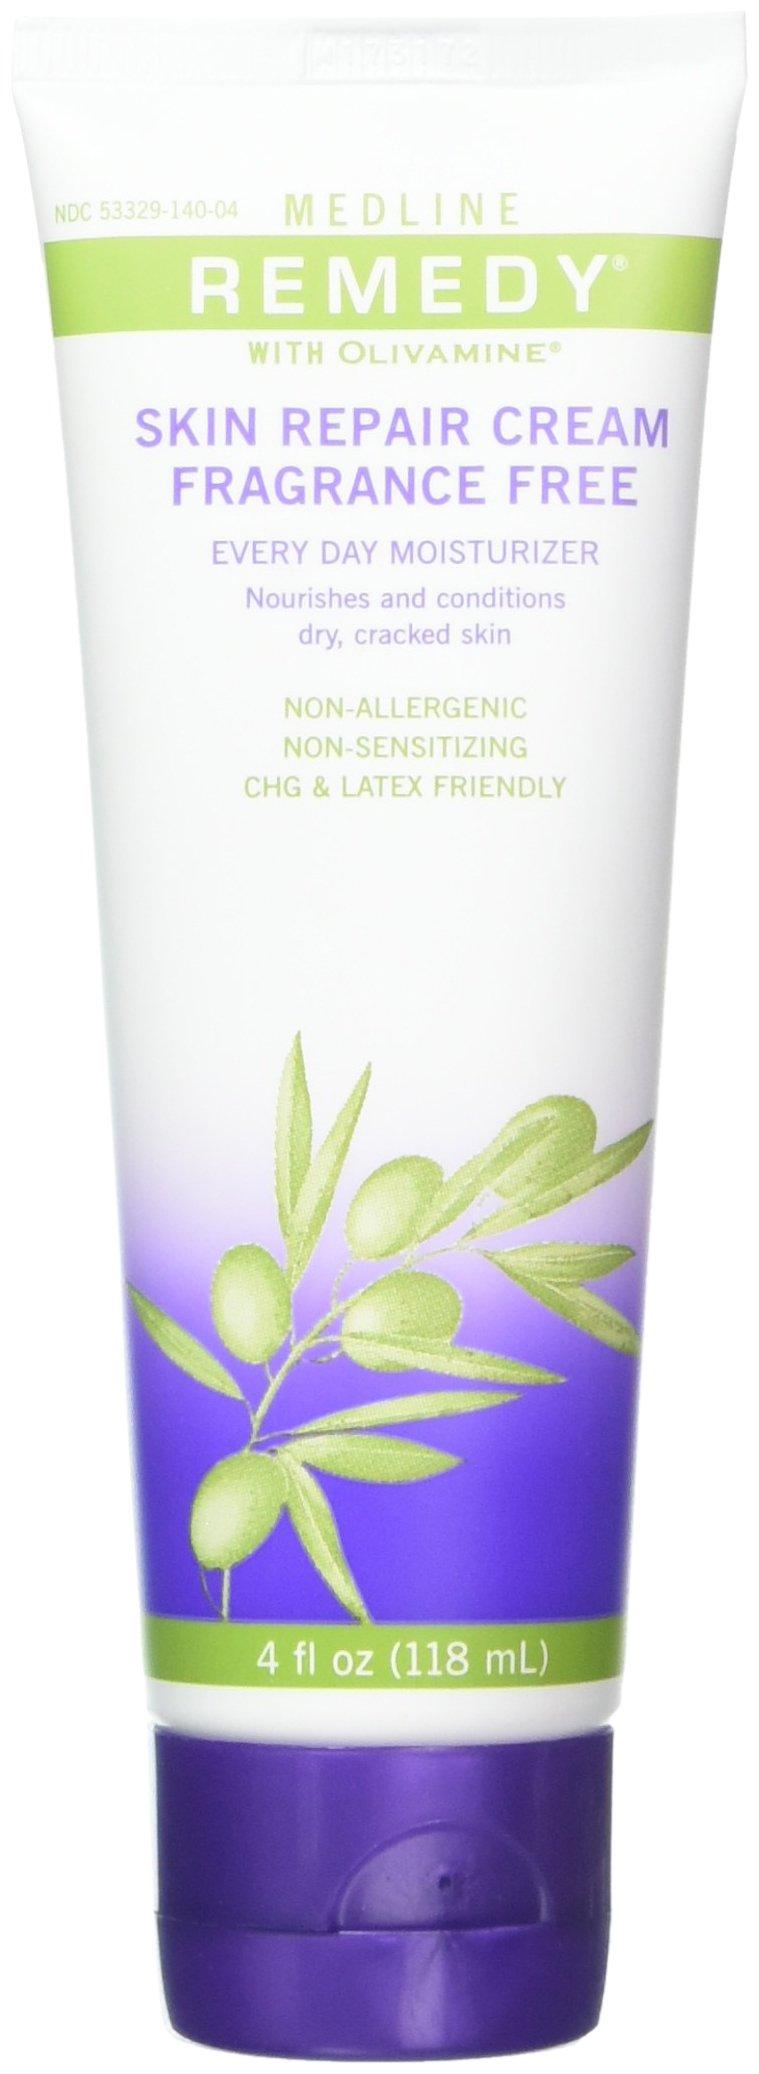 Medline Remedy Skin Repair Cream with Olivamine, 4 Ounce Lumene Sensitive Touch Comforting Night Cream, Sensitive Skin 1.7 fl oz (50 ml) By Chom